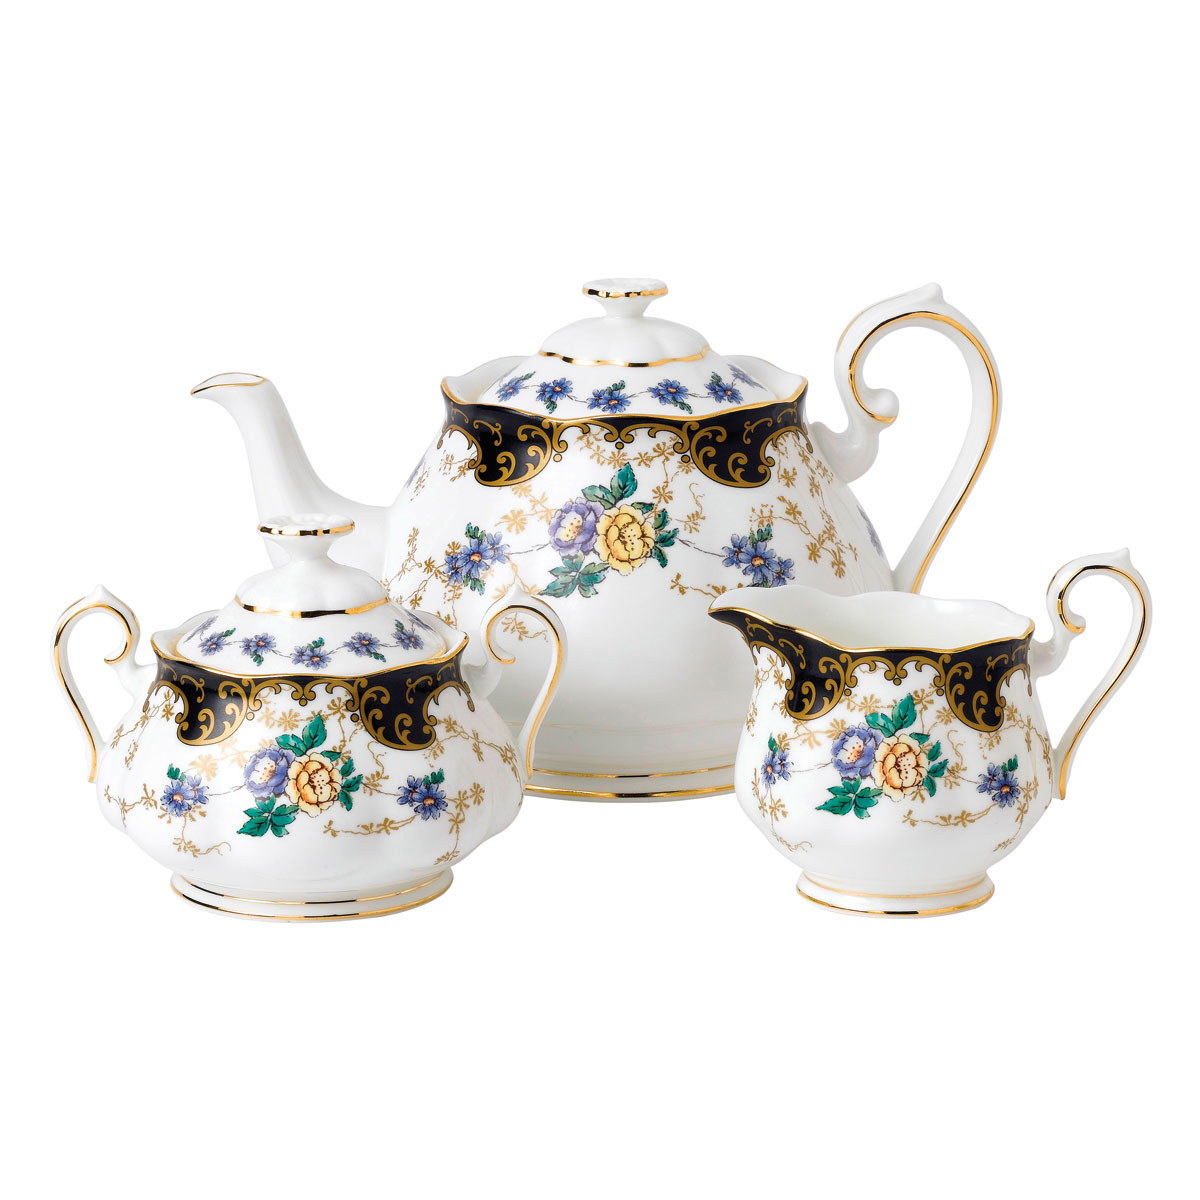 Royal Albert 100 Years 1910 Teapot, Sugar and Creamer Set Duchess